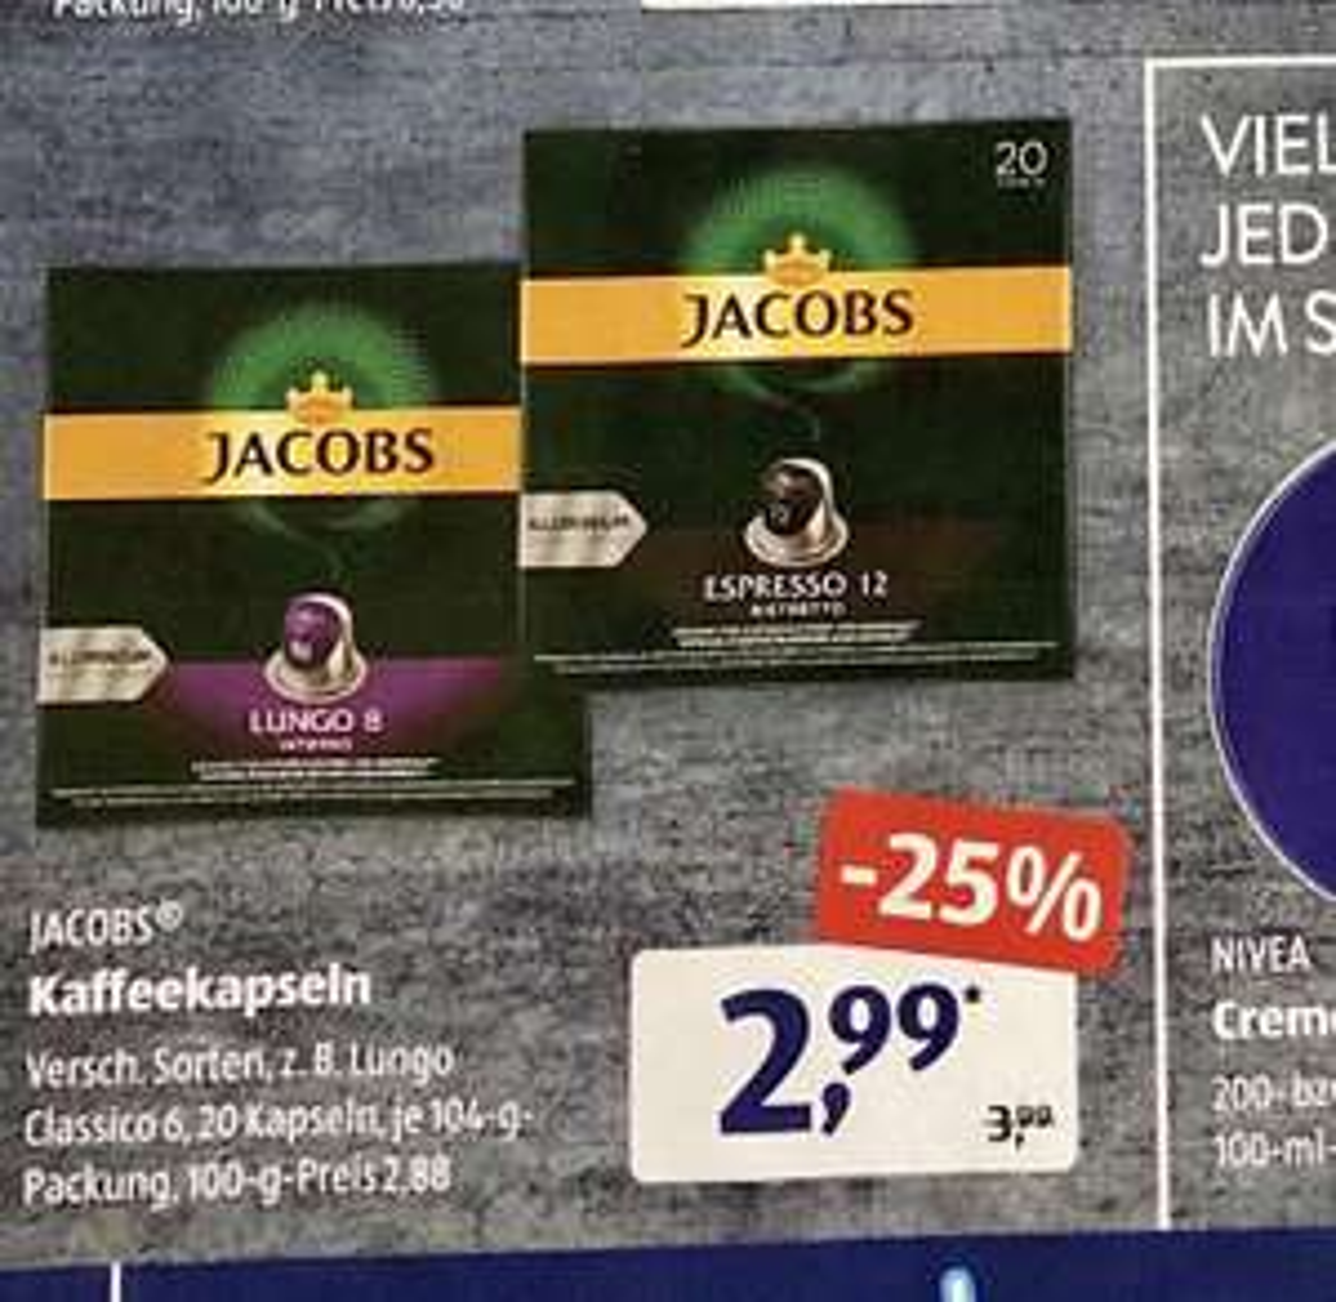 Jacobs Kaffee-Kapseln für Nespresso, lokal, offline, AldiSüd